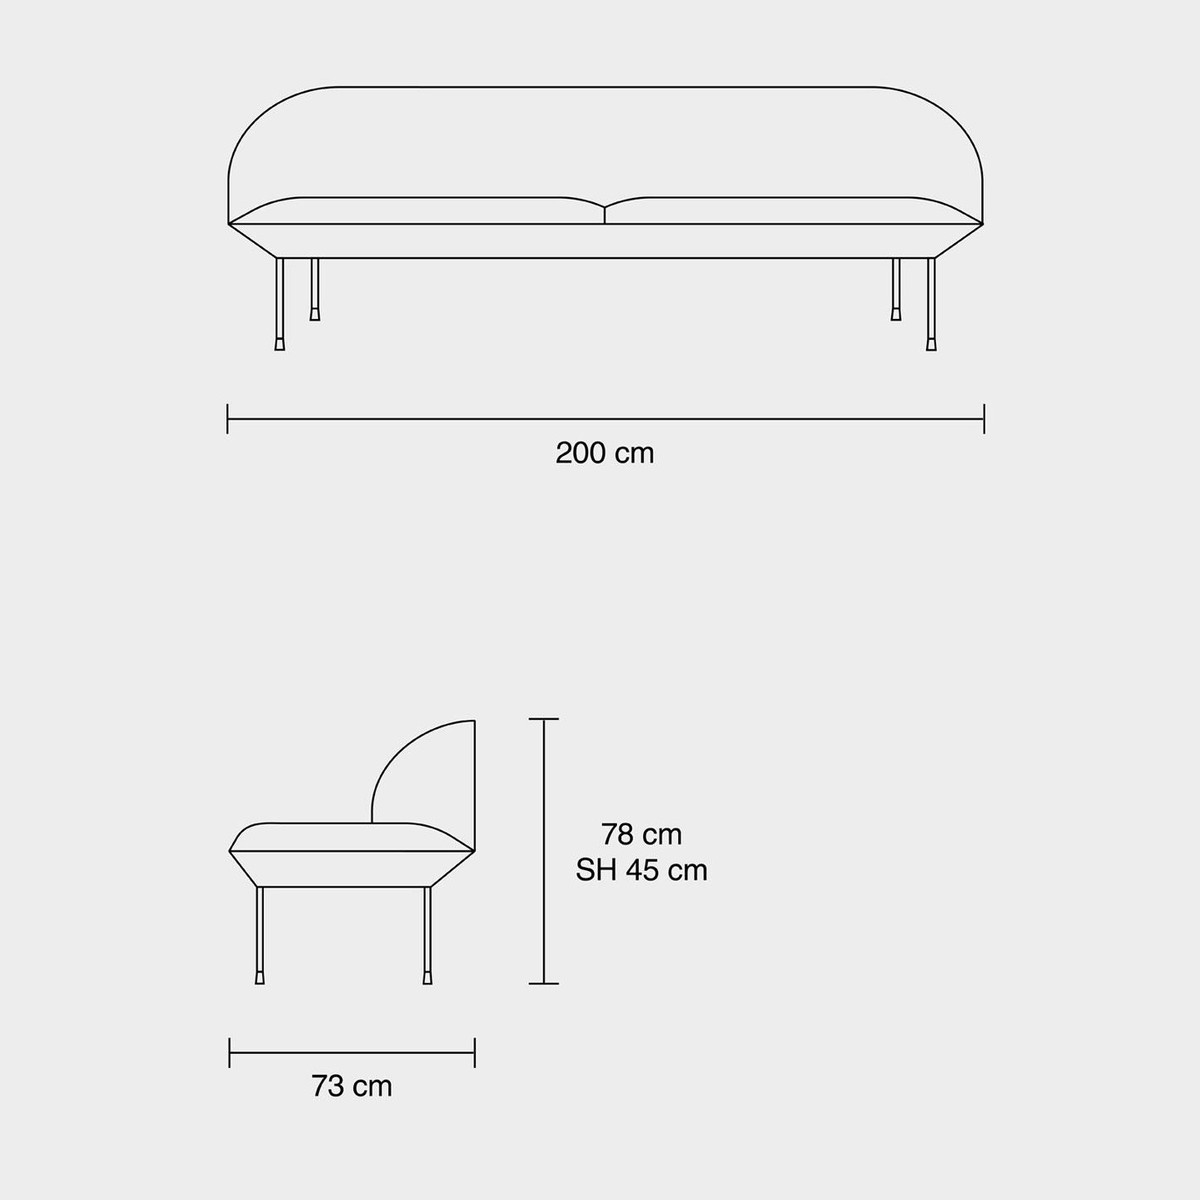 Pop Missoni Sofa Design Sofa Kartell 2 Or 3 Seats With: AmbienteDirect.com